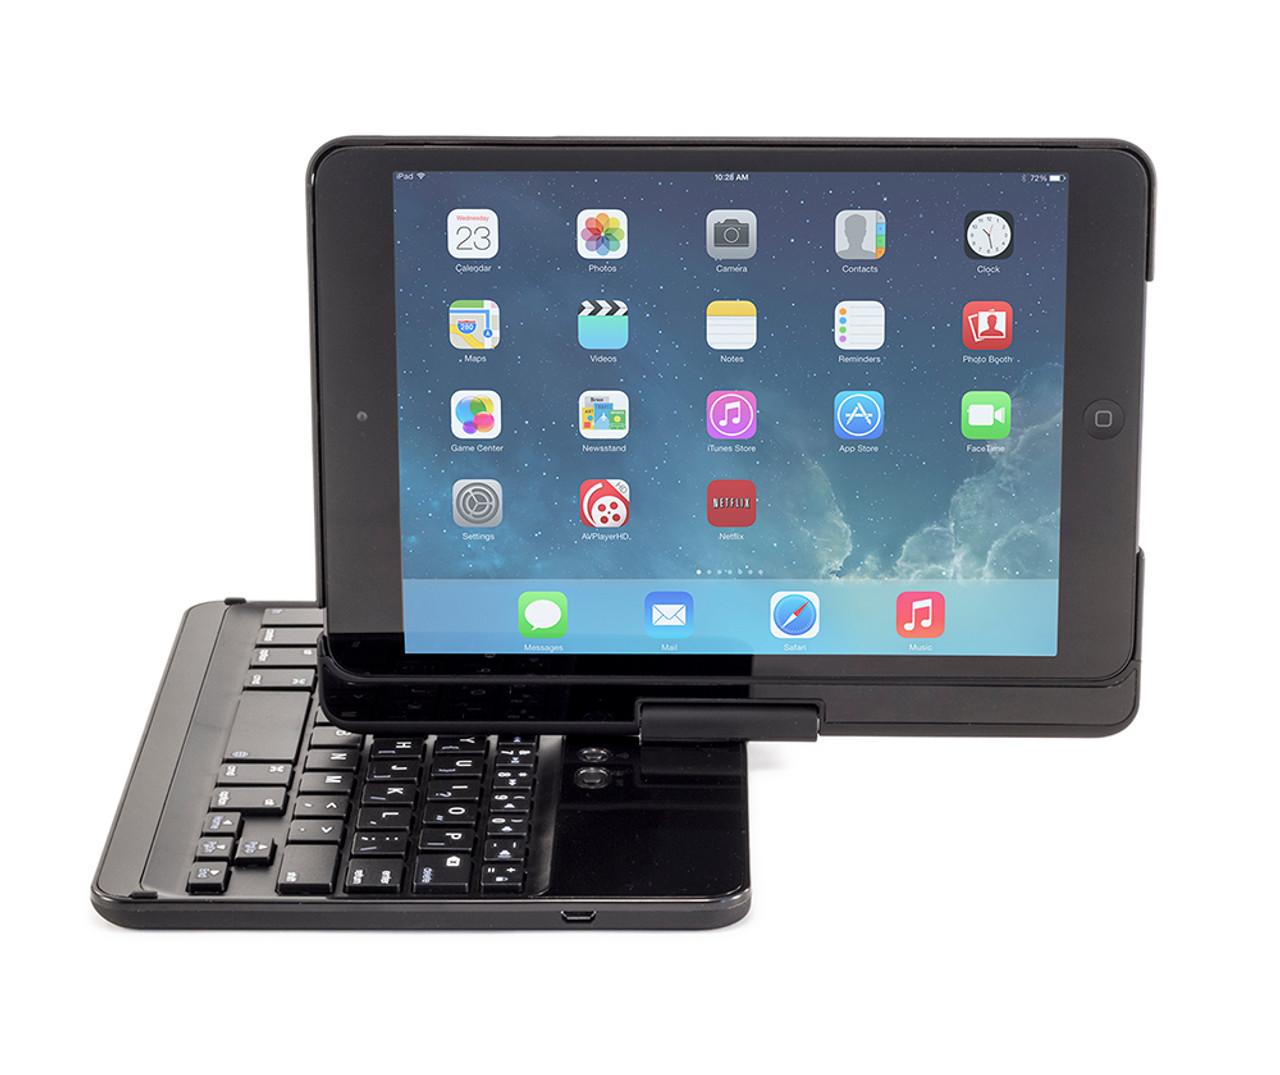 71bb2feab51 360° Rotating Keyboard Case for iPad Mini and Mini 2 - by Kingrain ...